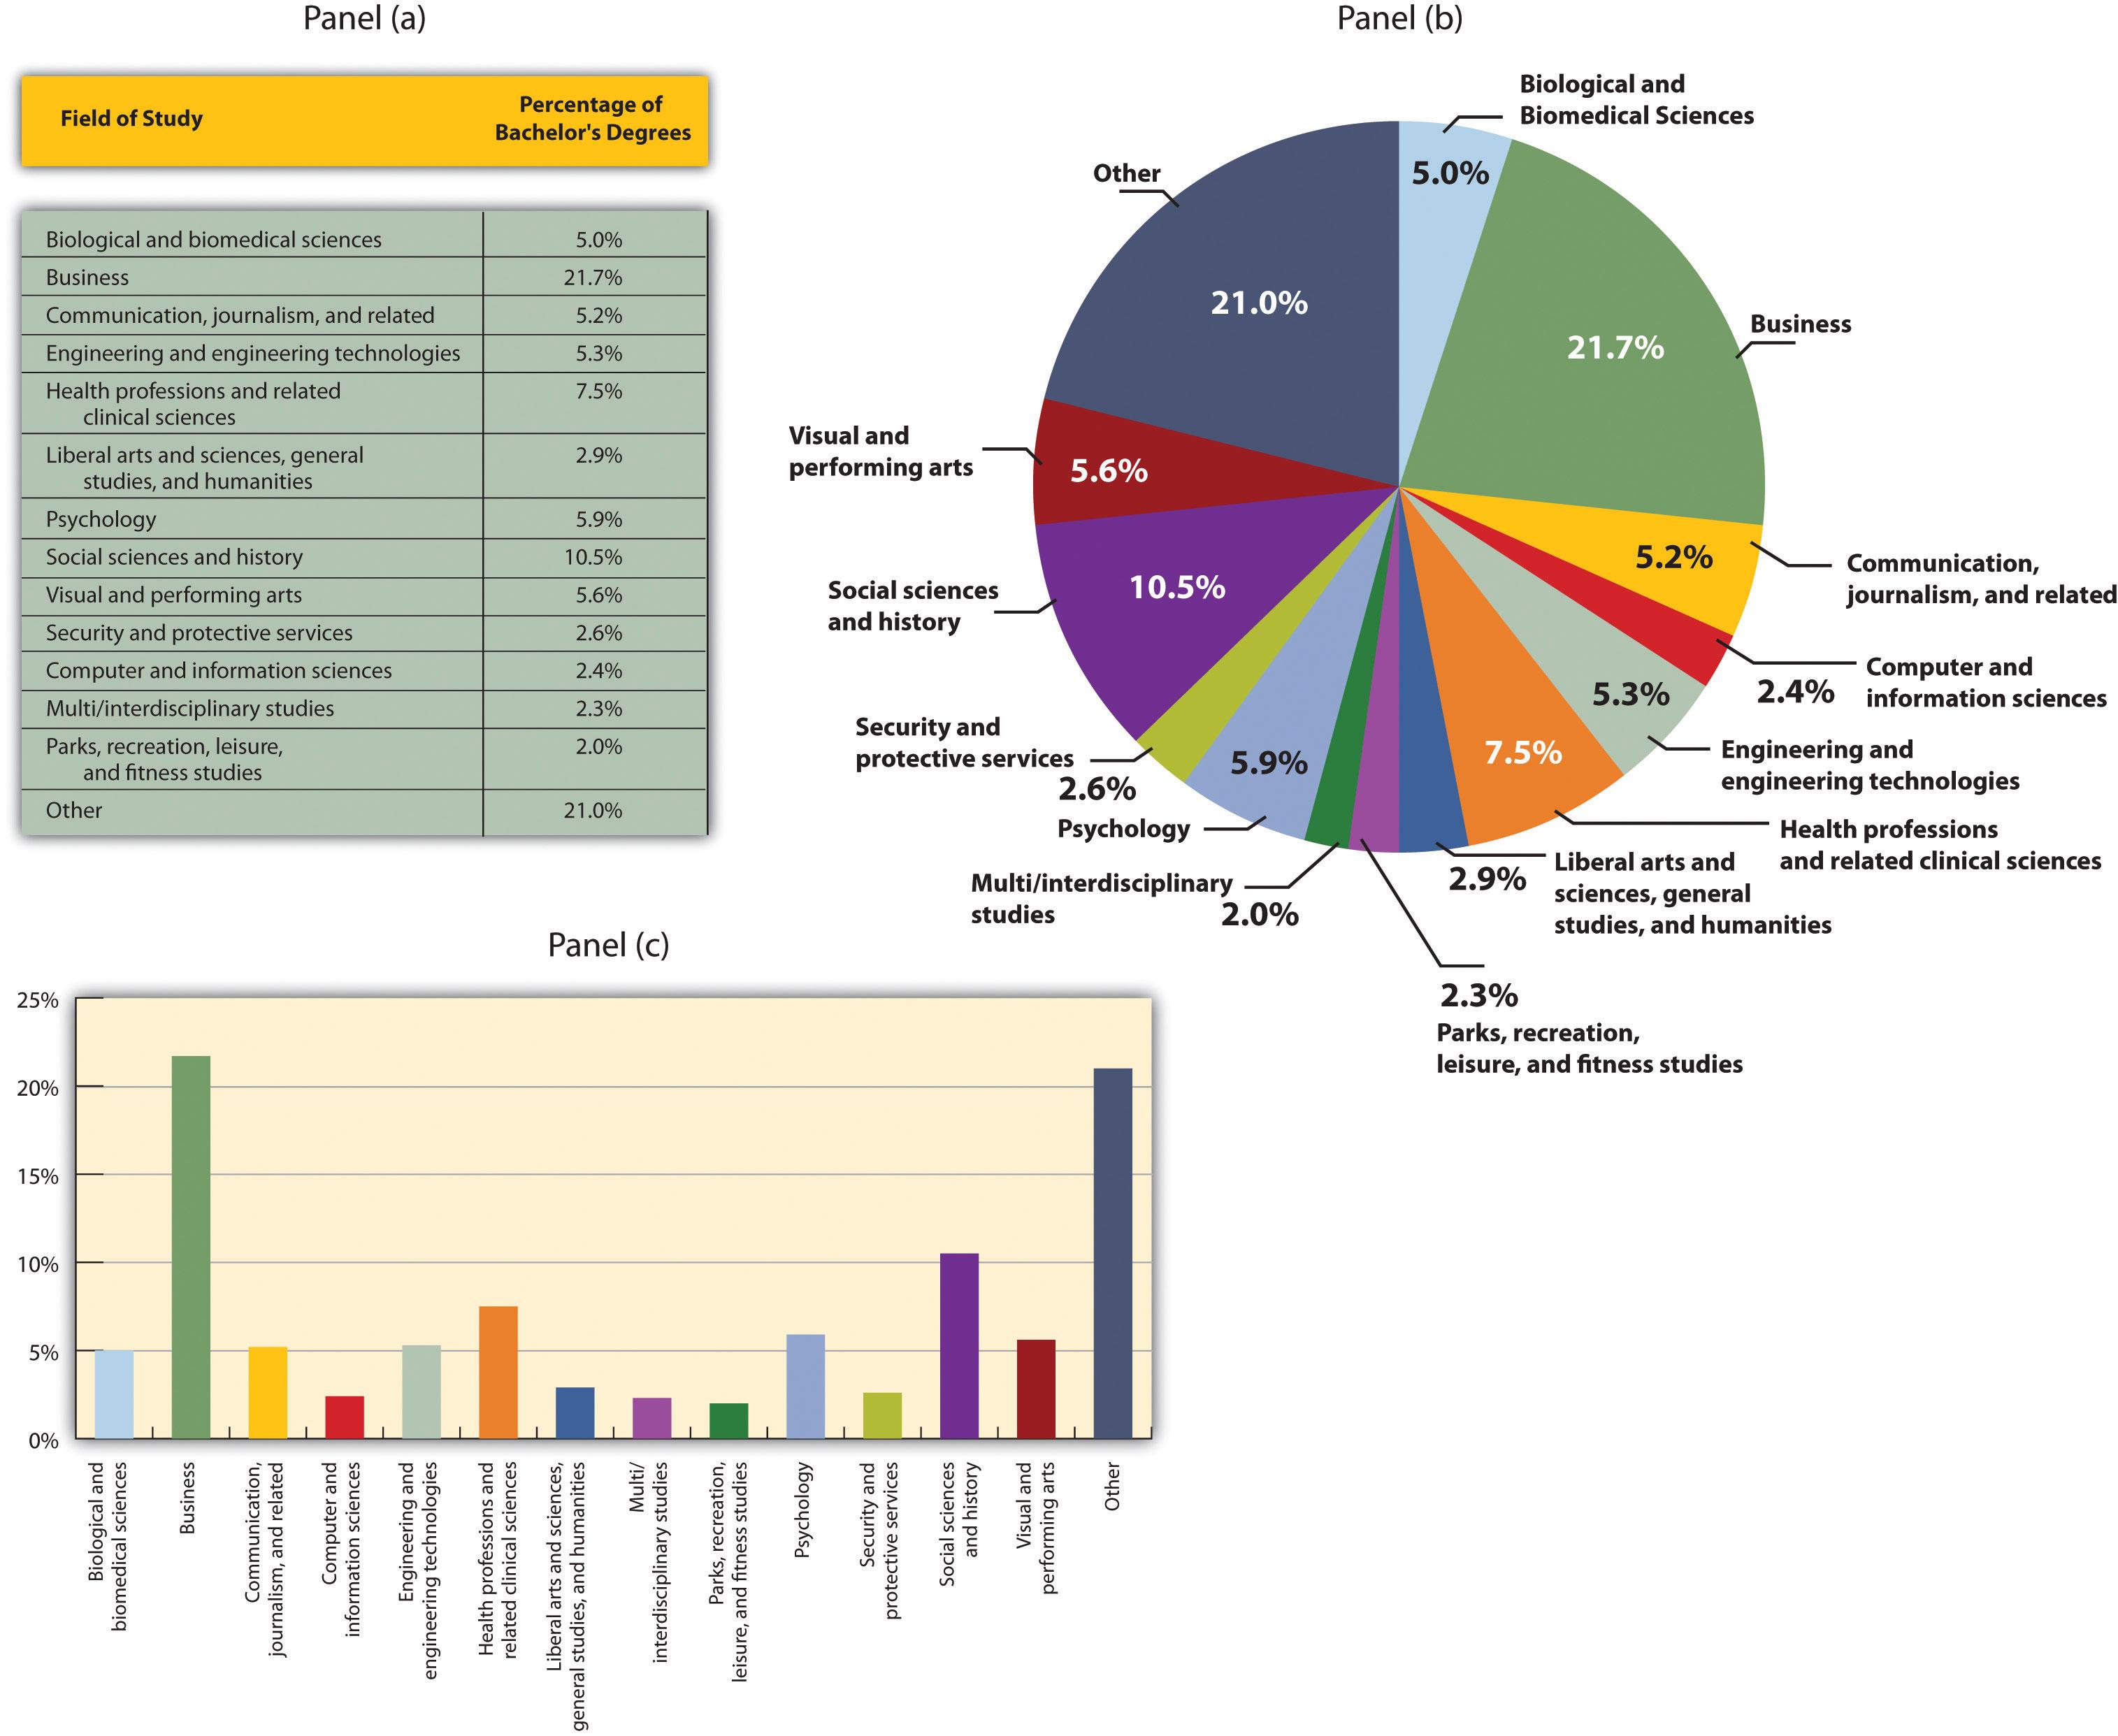 statistical analysis graphs and diagrams 6 circle writable venn diagram example principles of microeconomics v2 1 flatworld